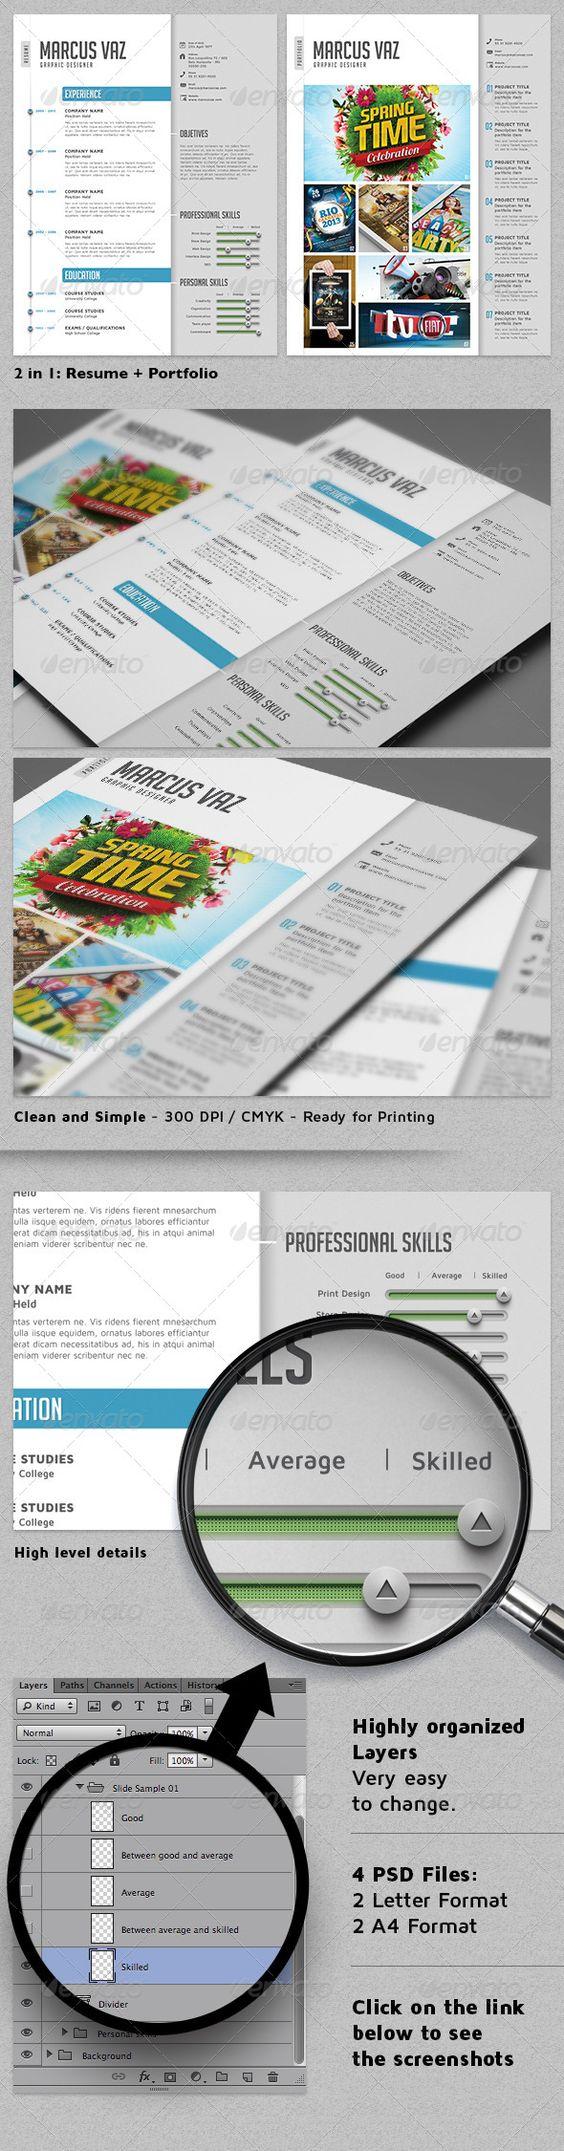 resume portfolio template resumes stationery hmmmms and resume portfolio template resumes stationery